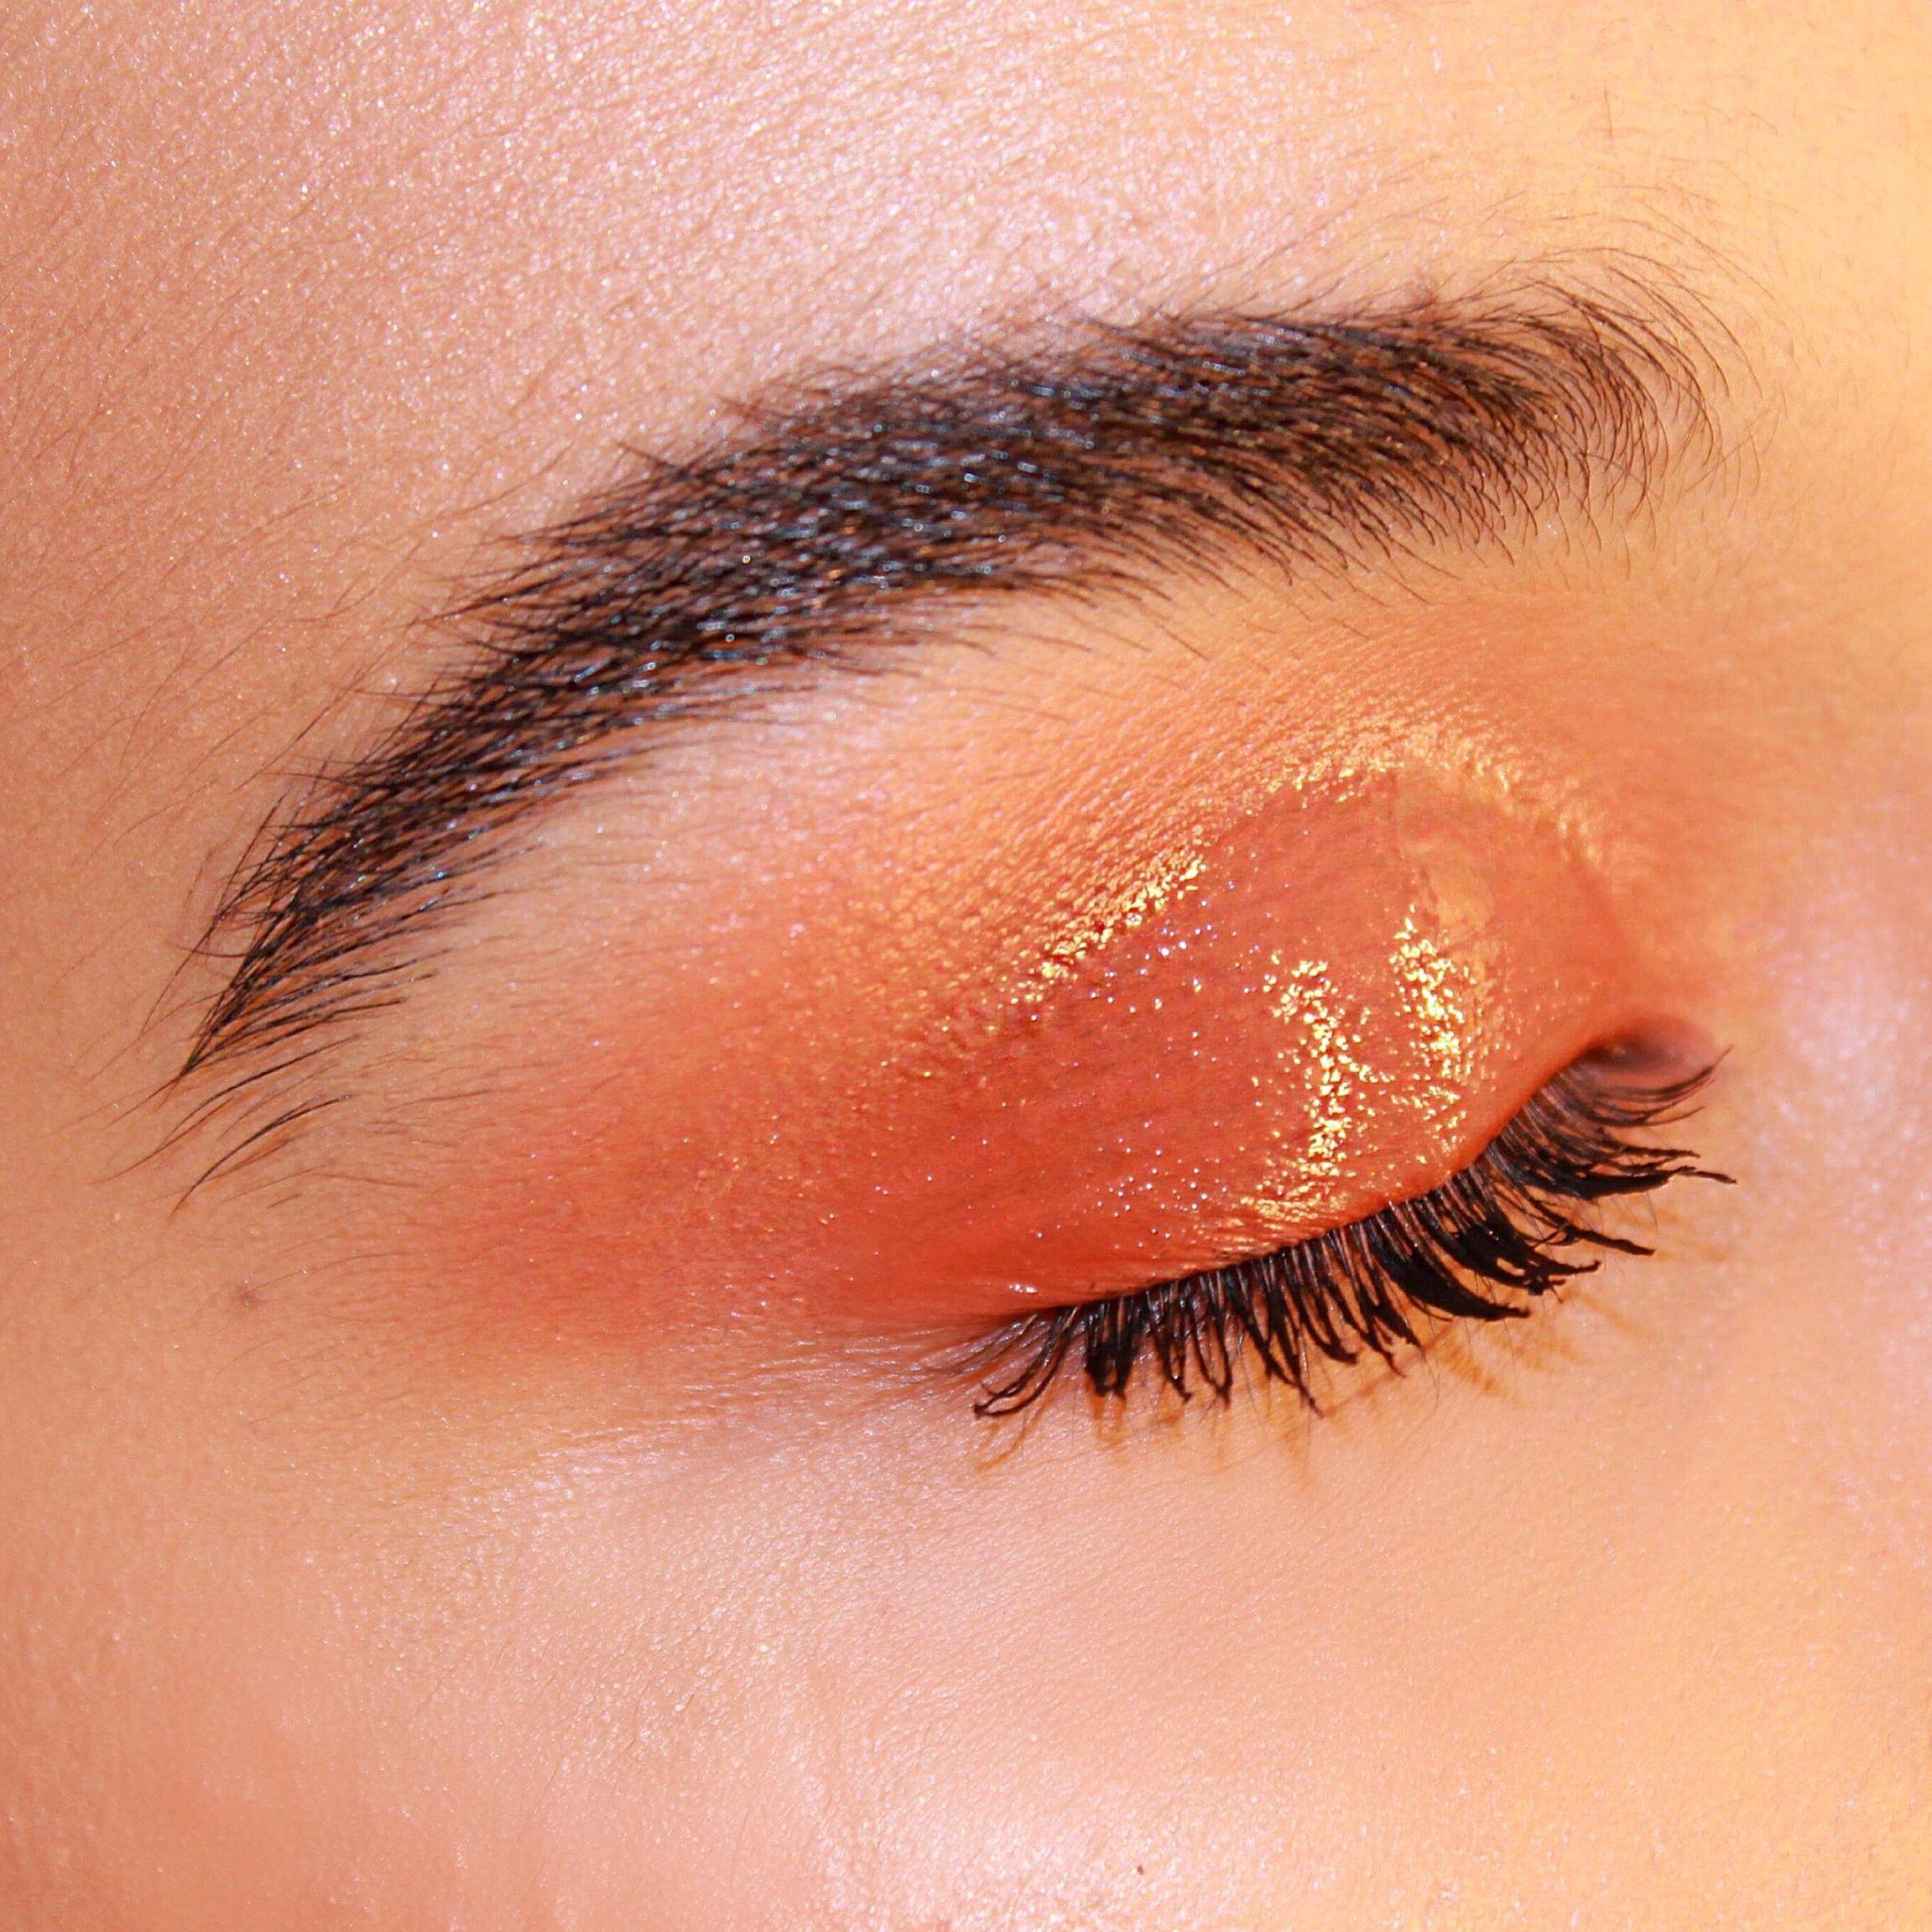 Glossy eye makeup Makeup, Glossy eyes, Eye makeup